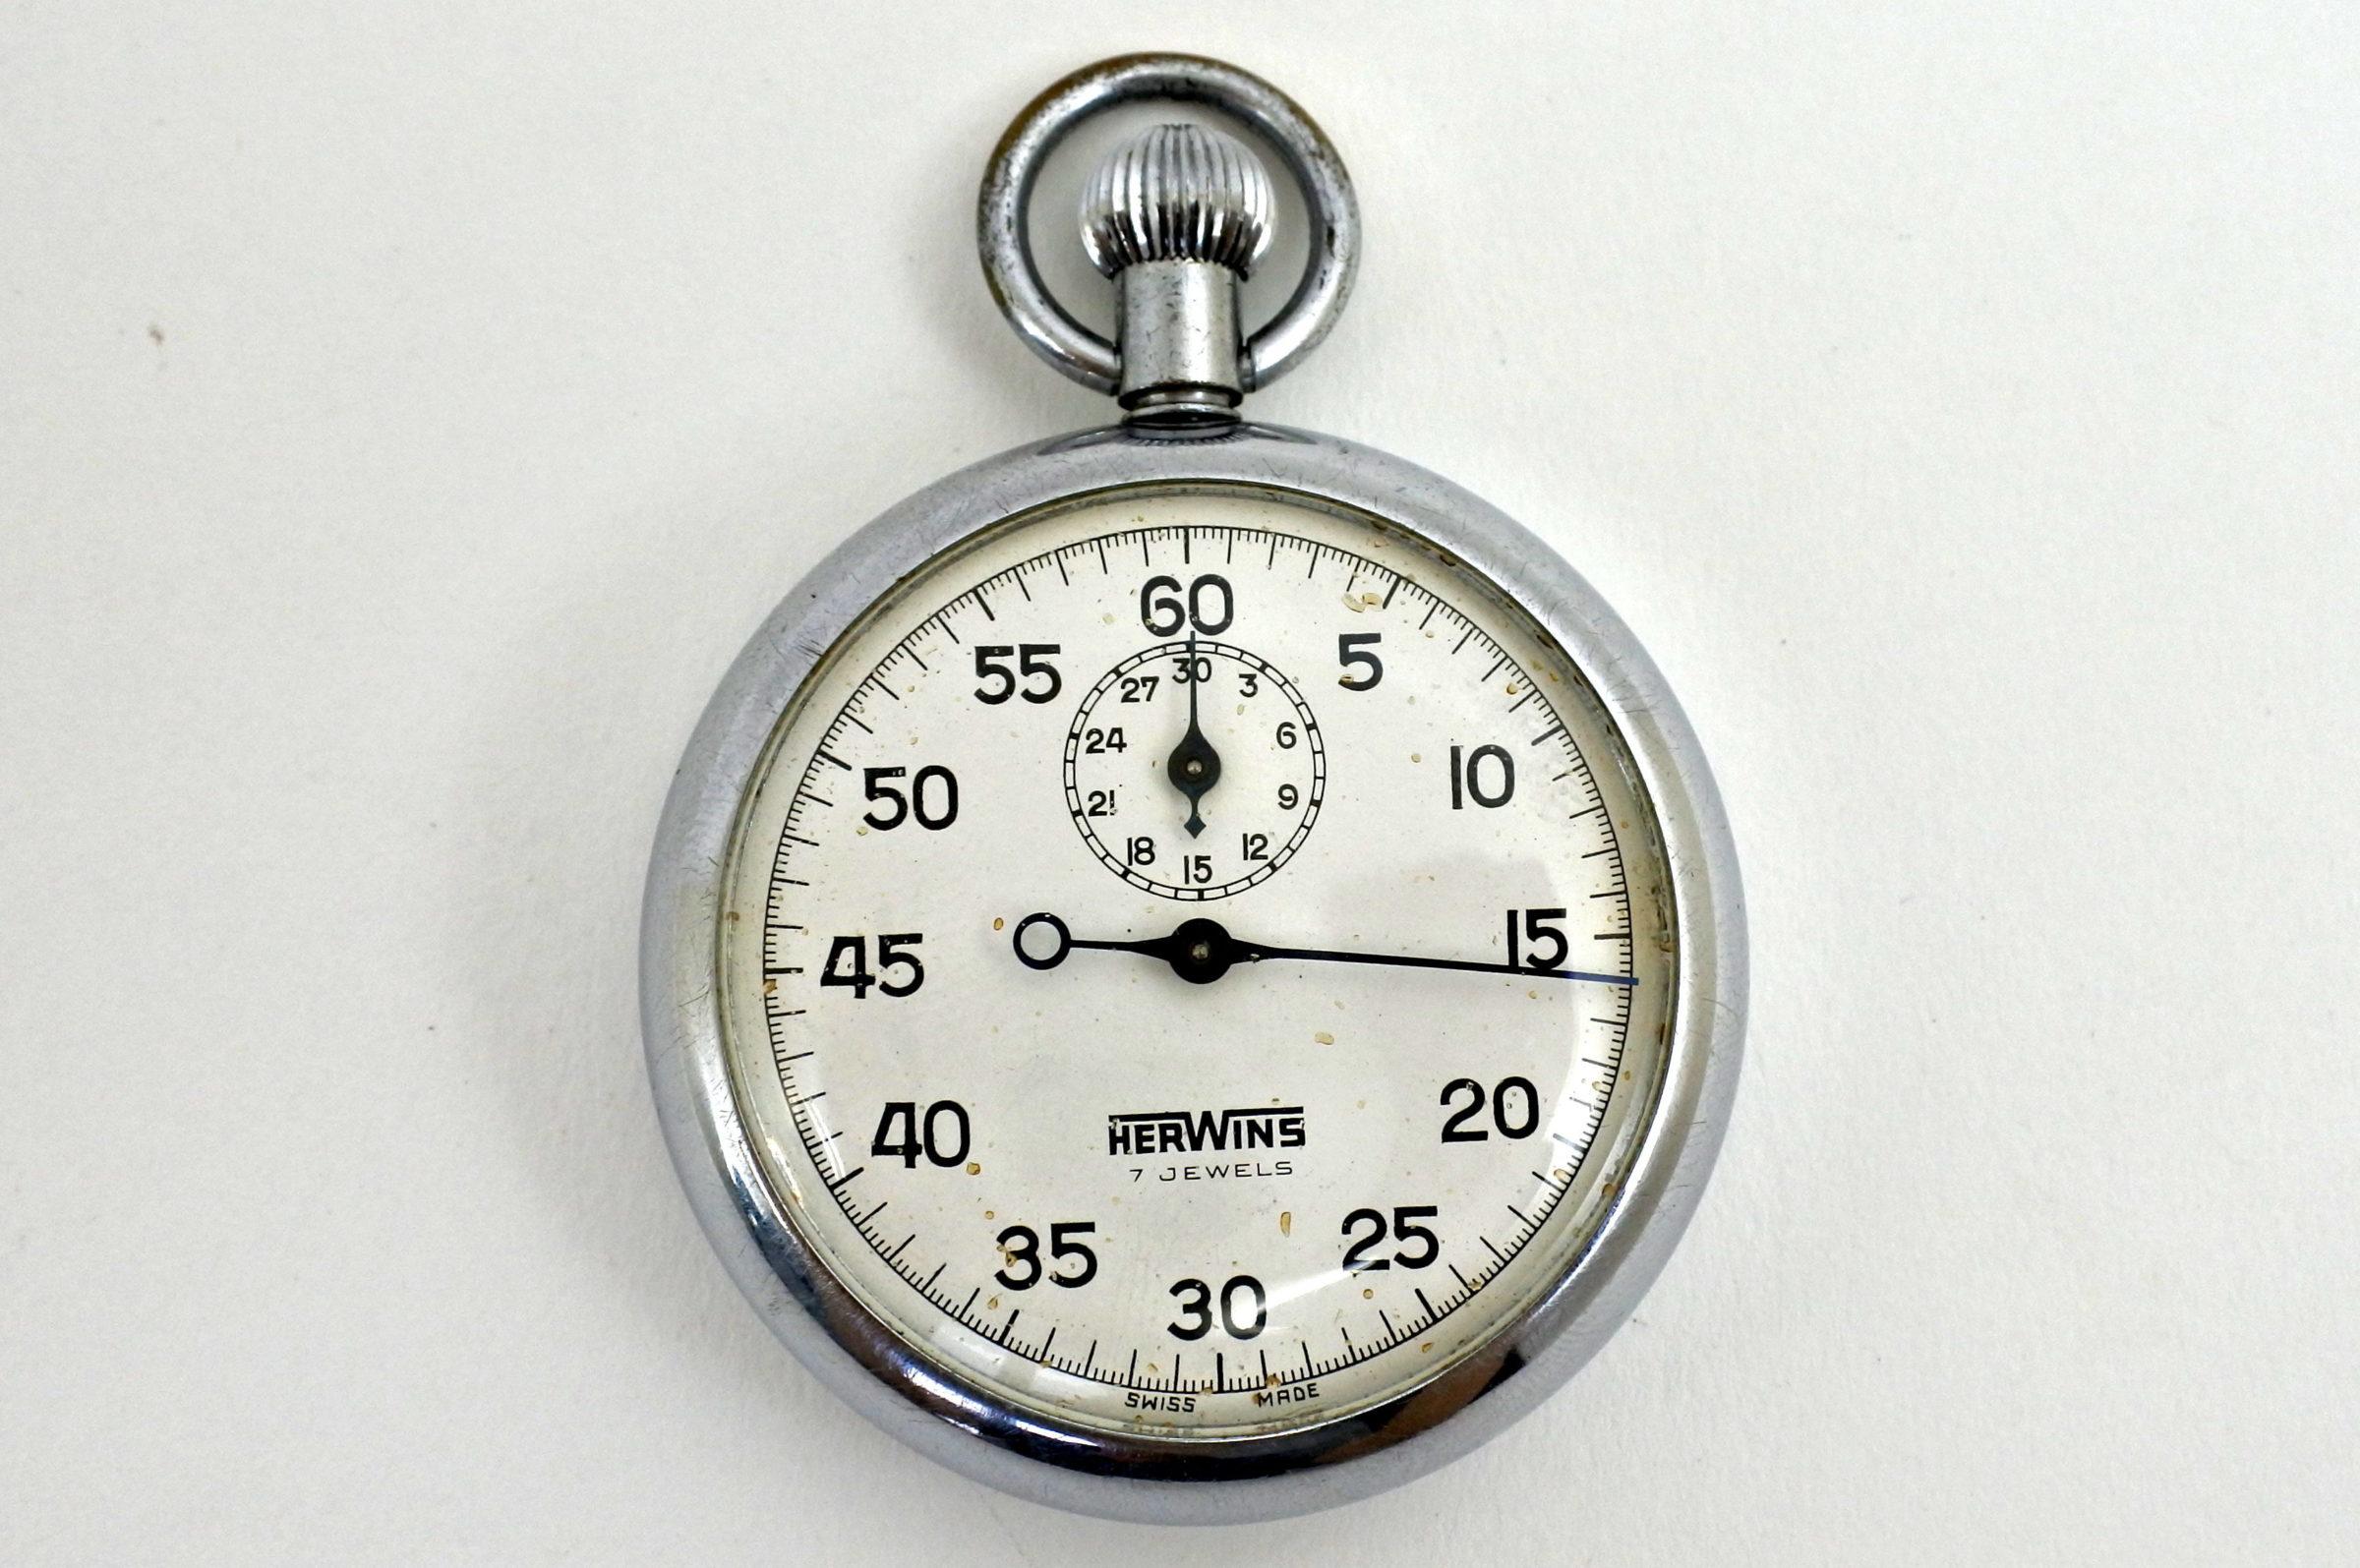 Cronometro Herwins